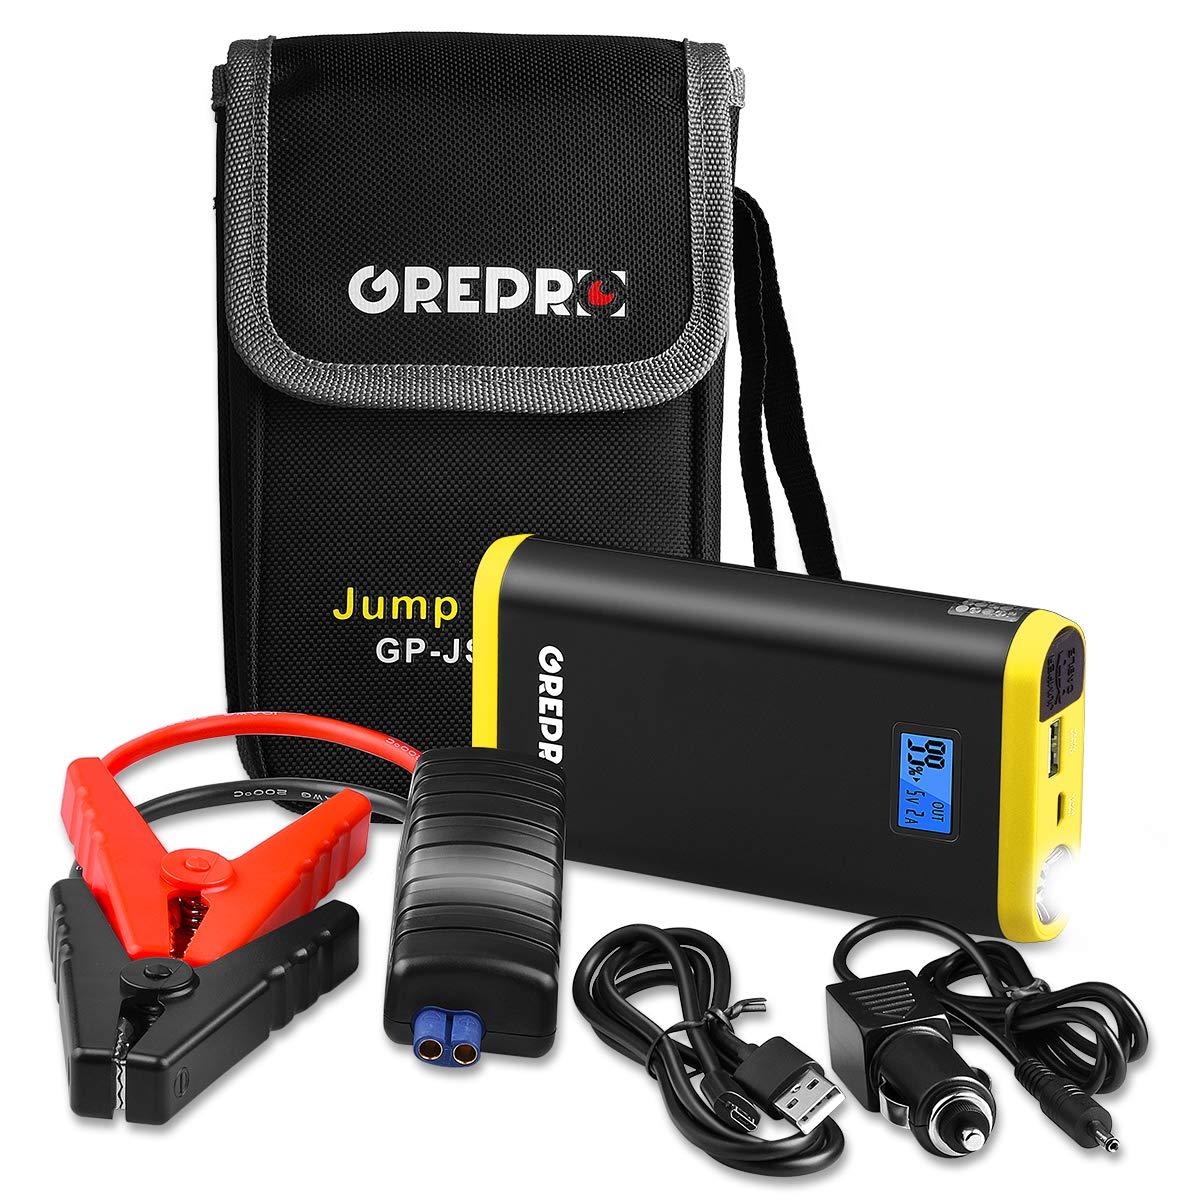 ignifugo Shell DBJ Potente Batteria di Emergenza Jump Starter 800/A Peak Booster Batteria Caricatore con Smart Intelligent Jump Cavo Doppia Uscita USB di Ricarica Rapida